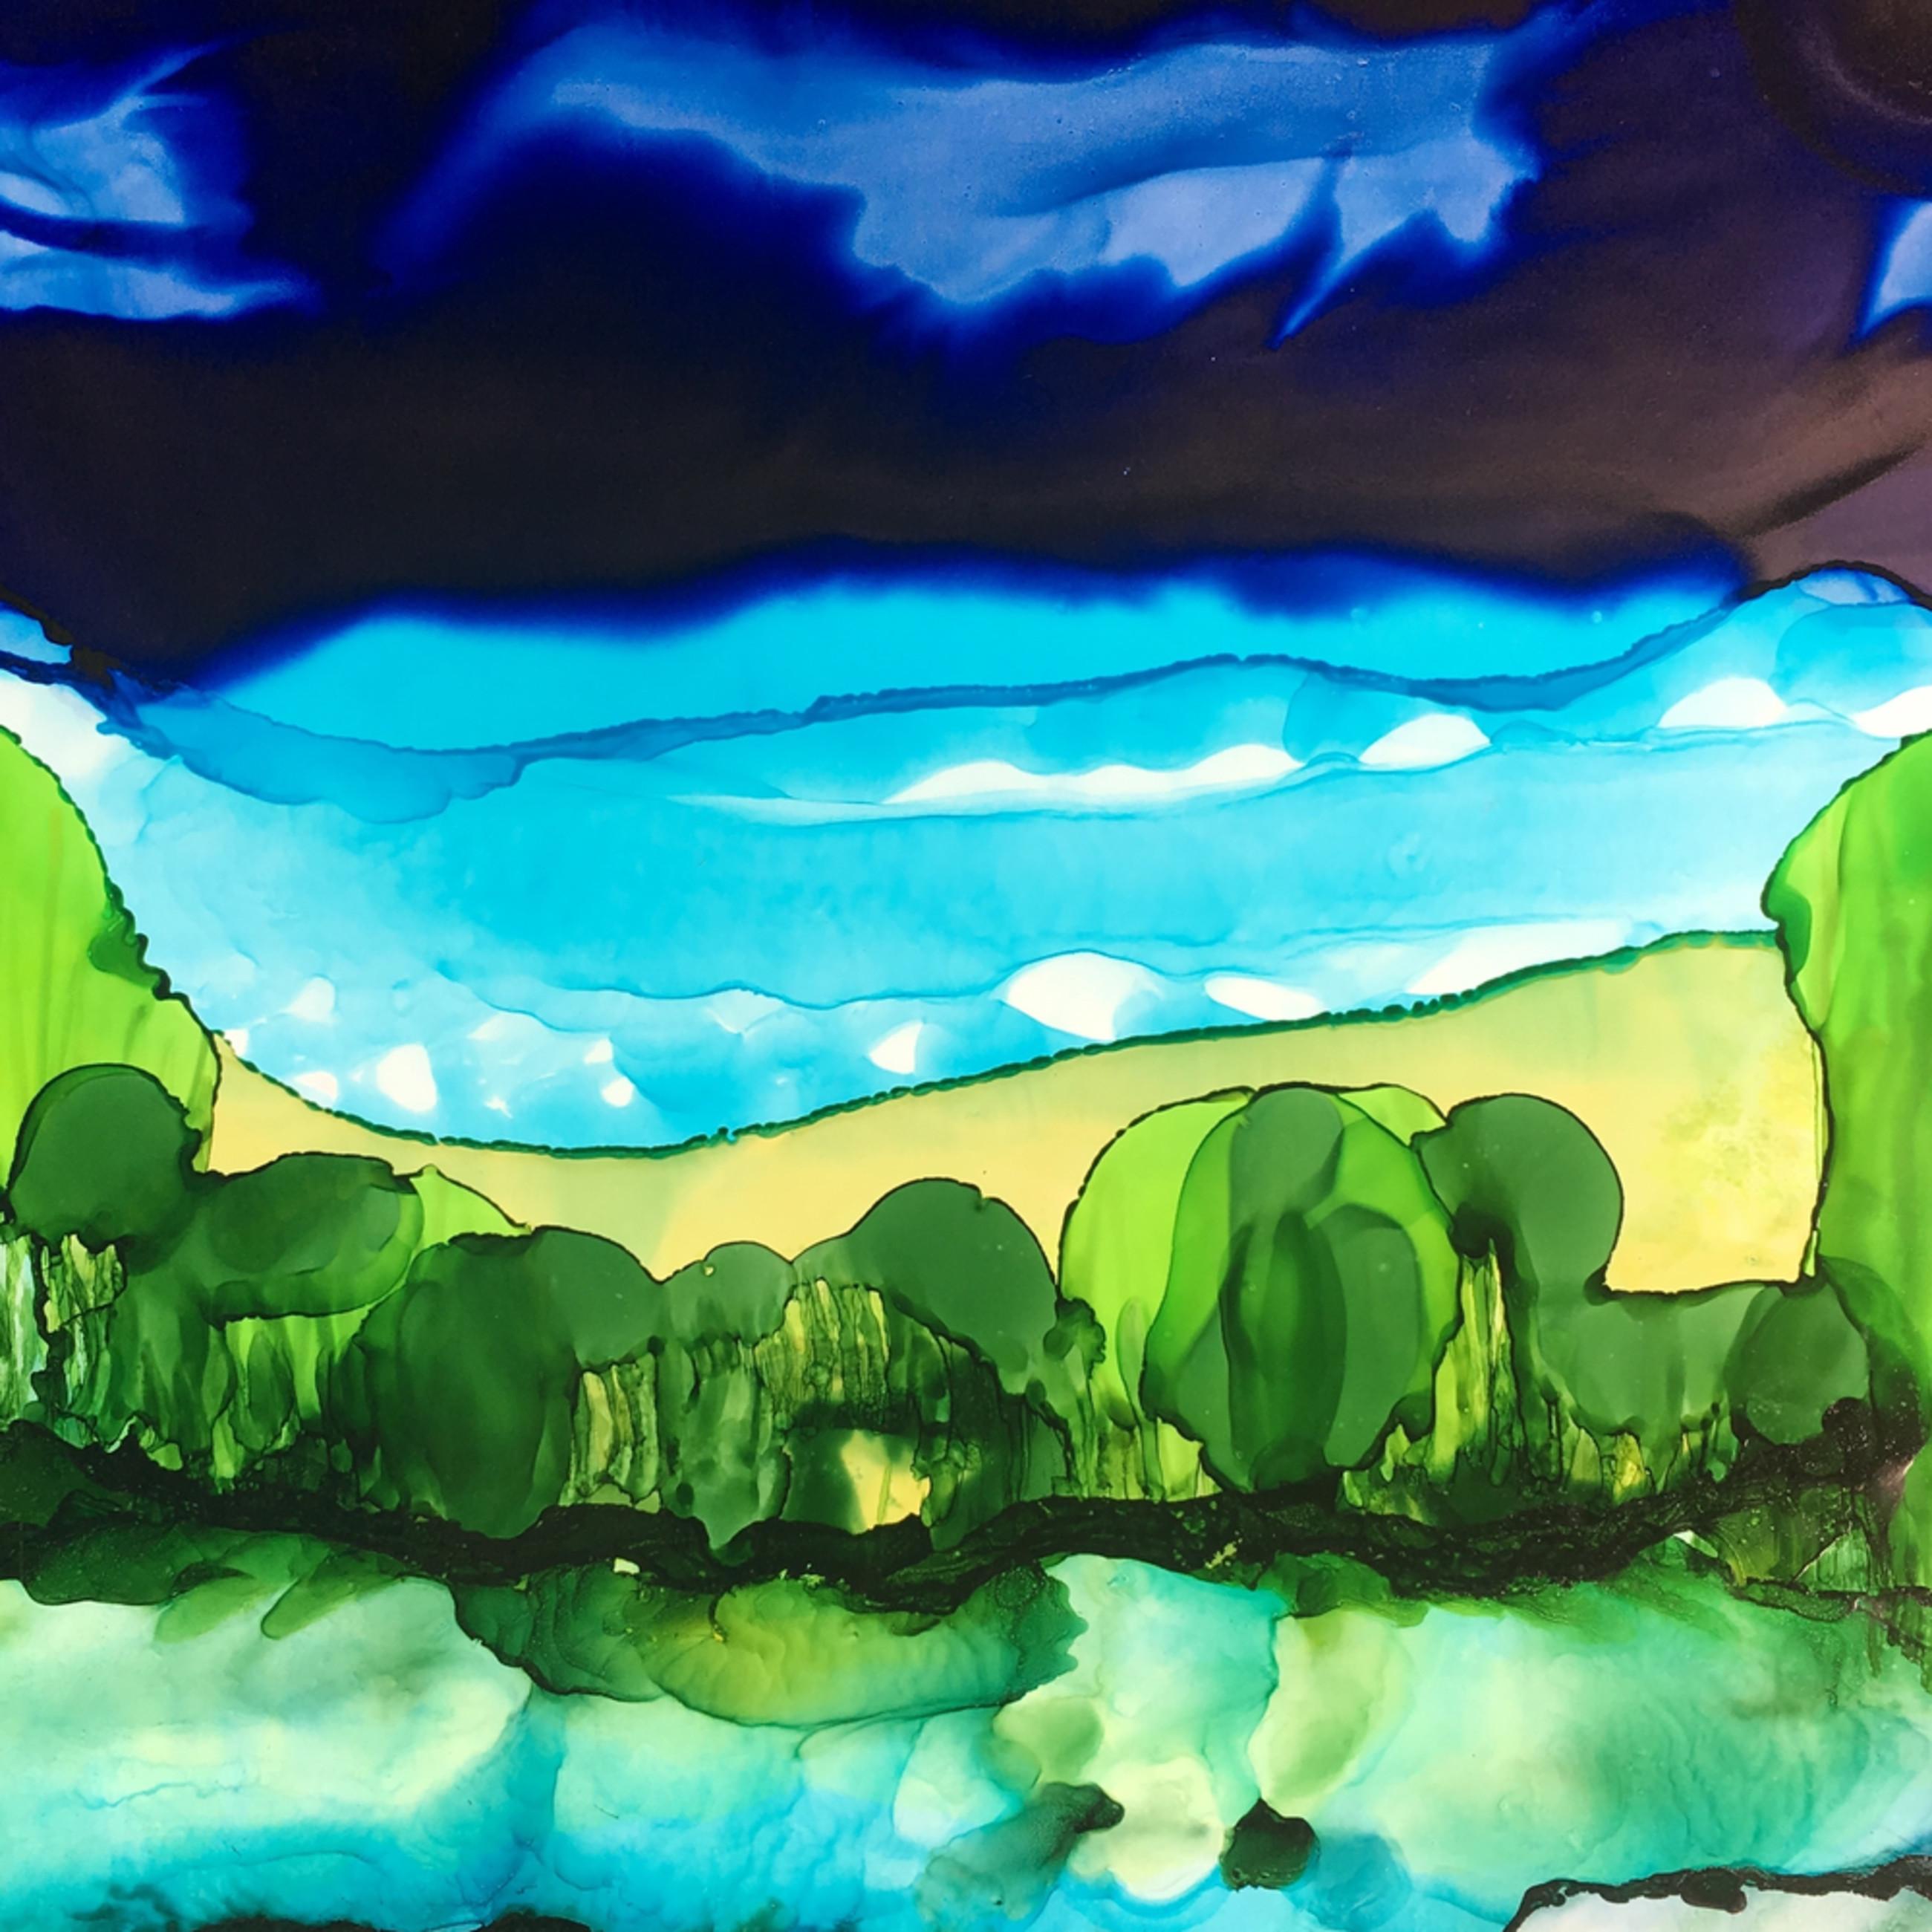 Landscape layers 6 2601 x 3794 gjnwth